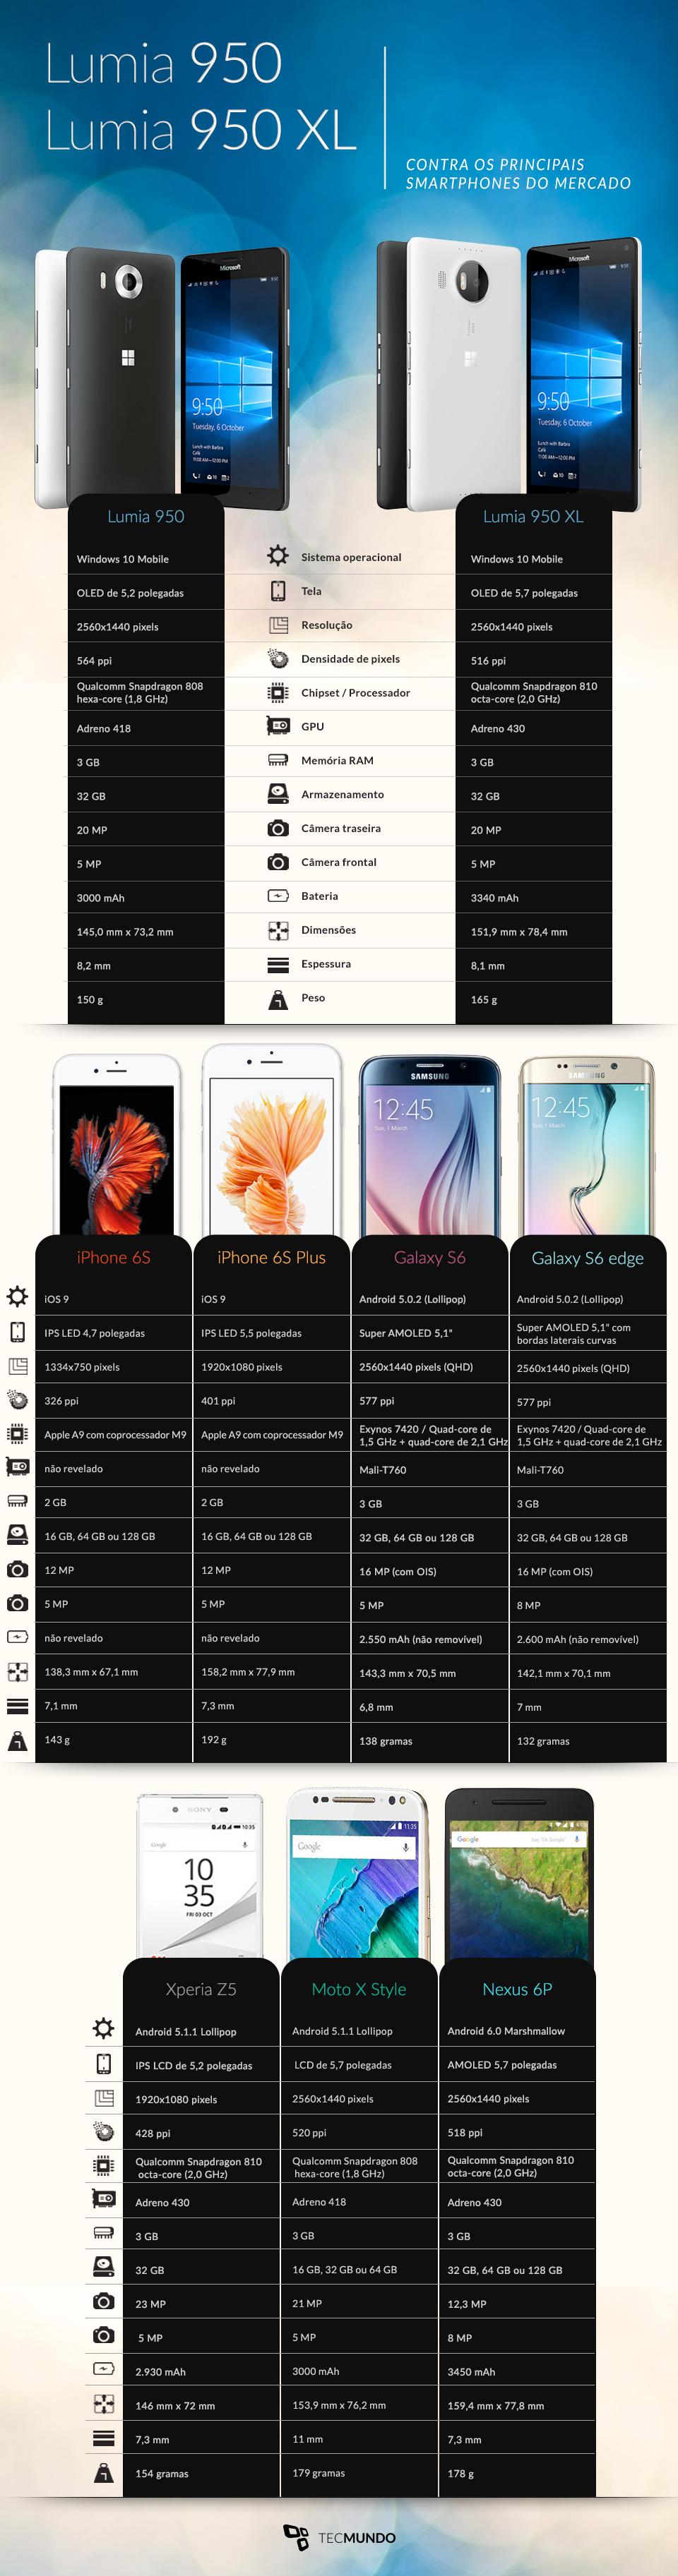 Microsoft Lumia 950 e 950 XL contra os principais concorrentes do mercado